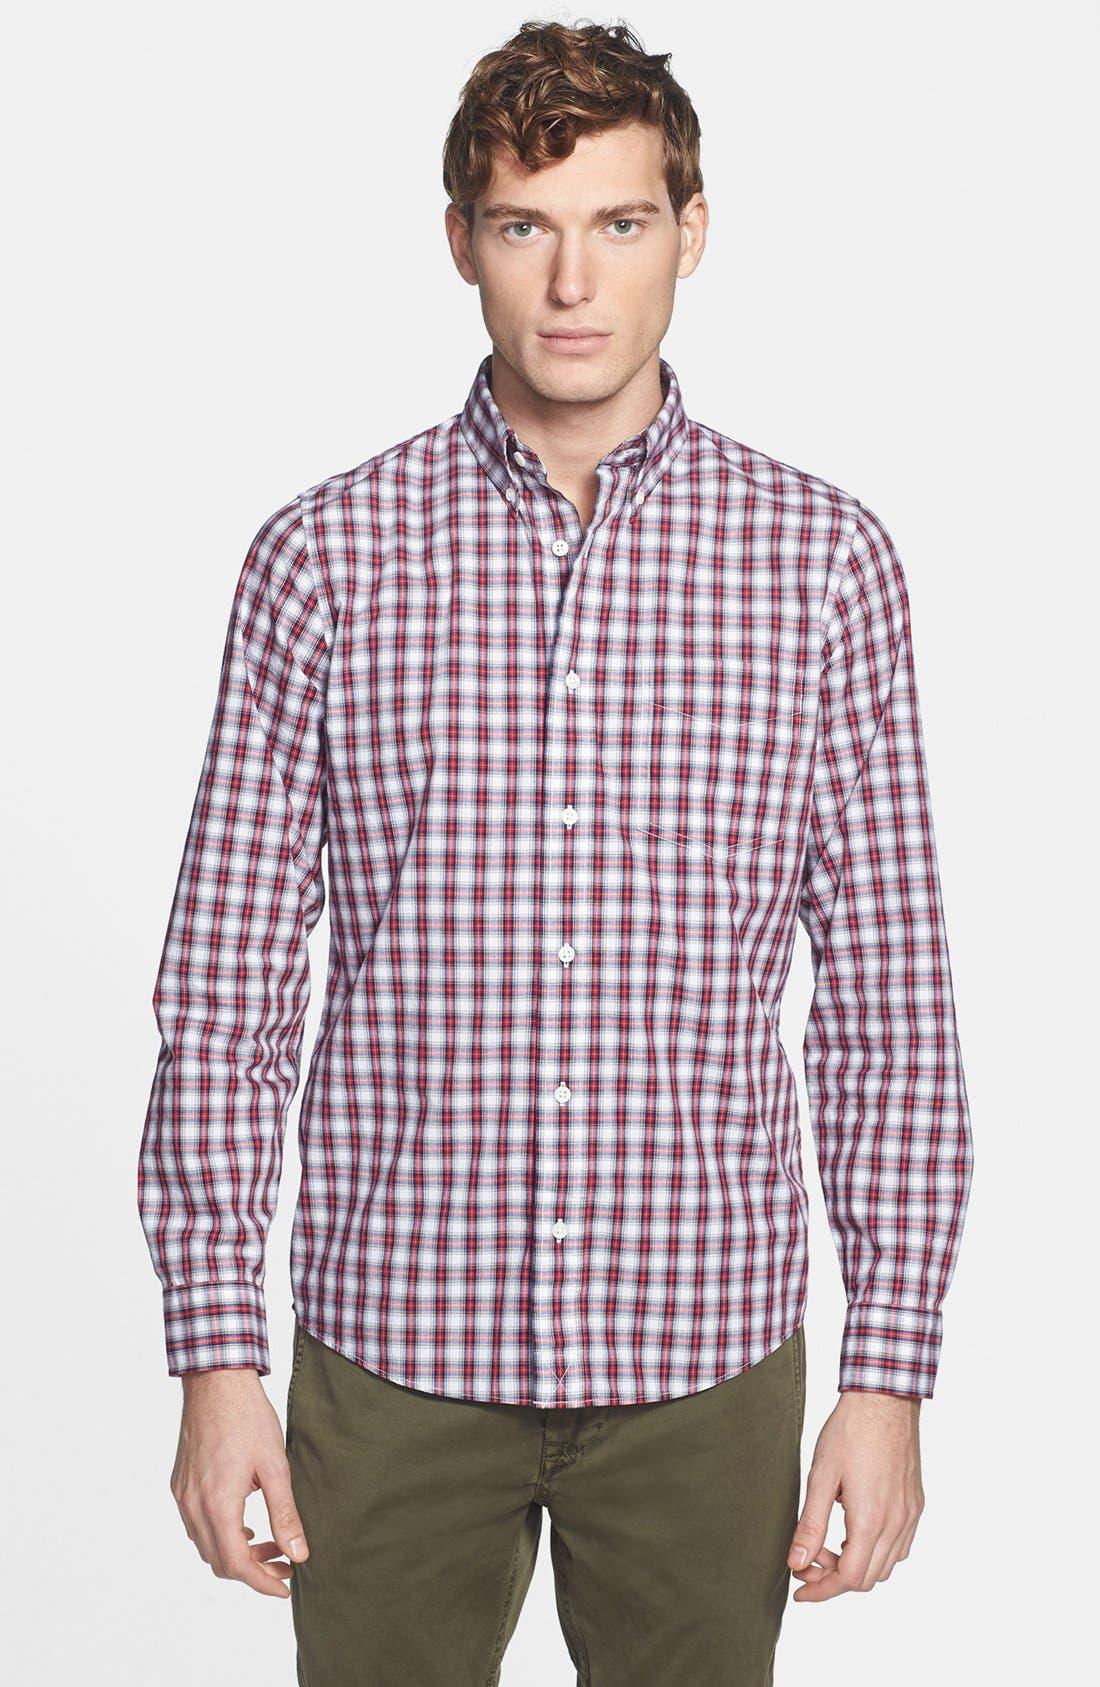 Alternate Image 1 Selected - Jack Spade 'Hawley' Plaid Shirt